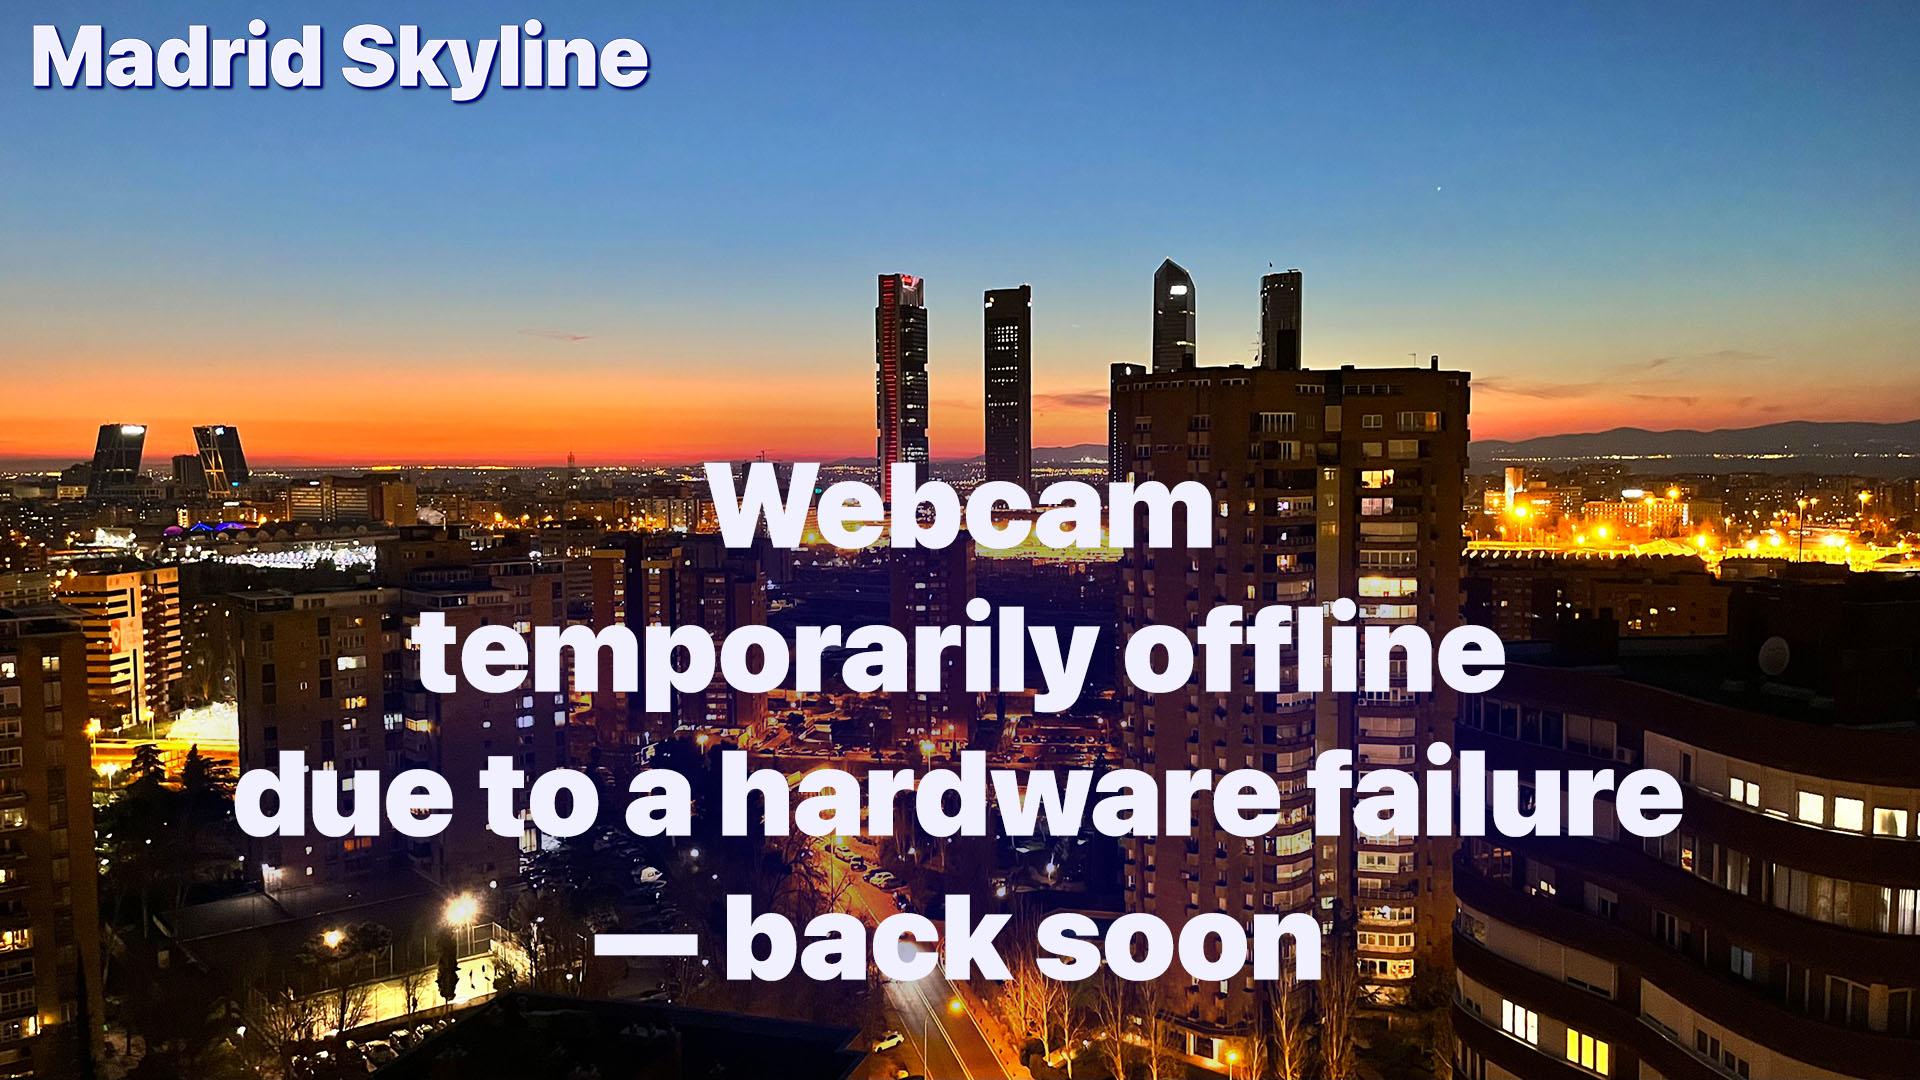 Madrid Skyline High Definition Webcam